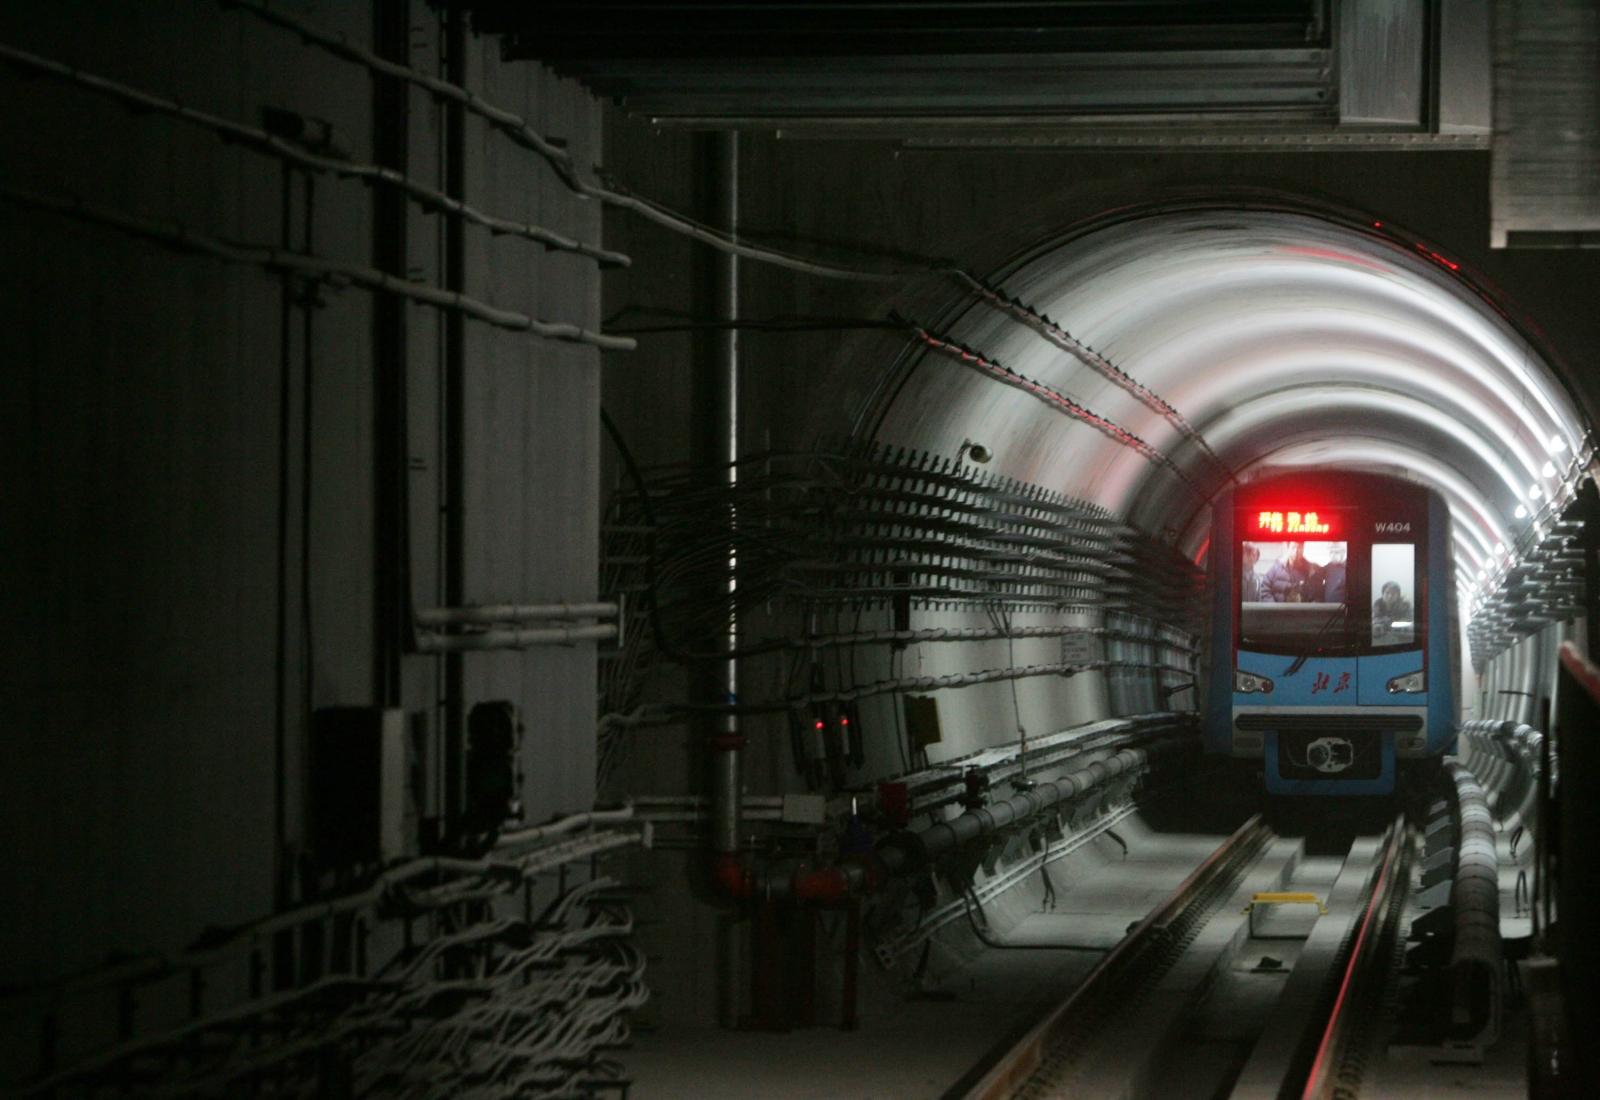 Beijing first driverless subway lines test starts